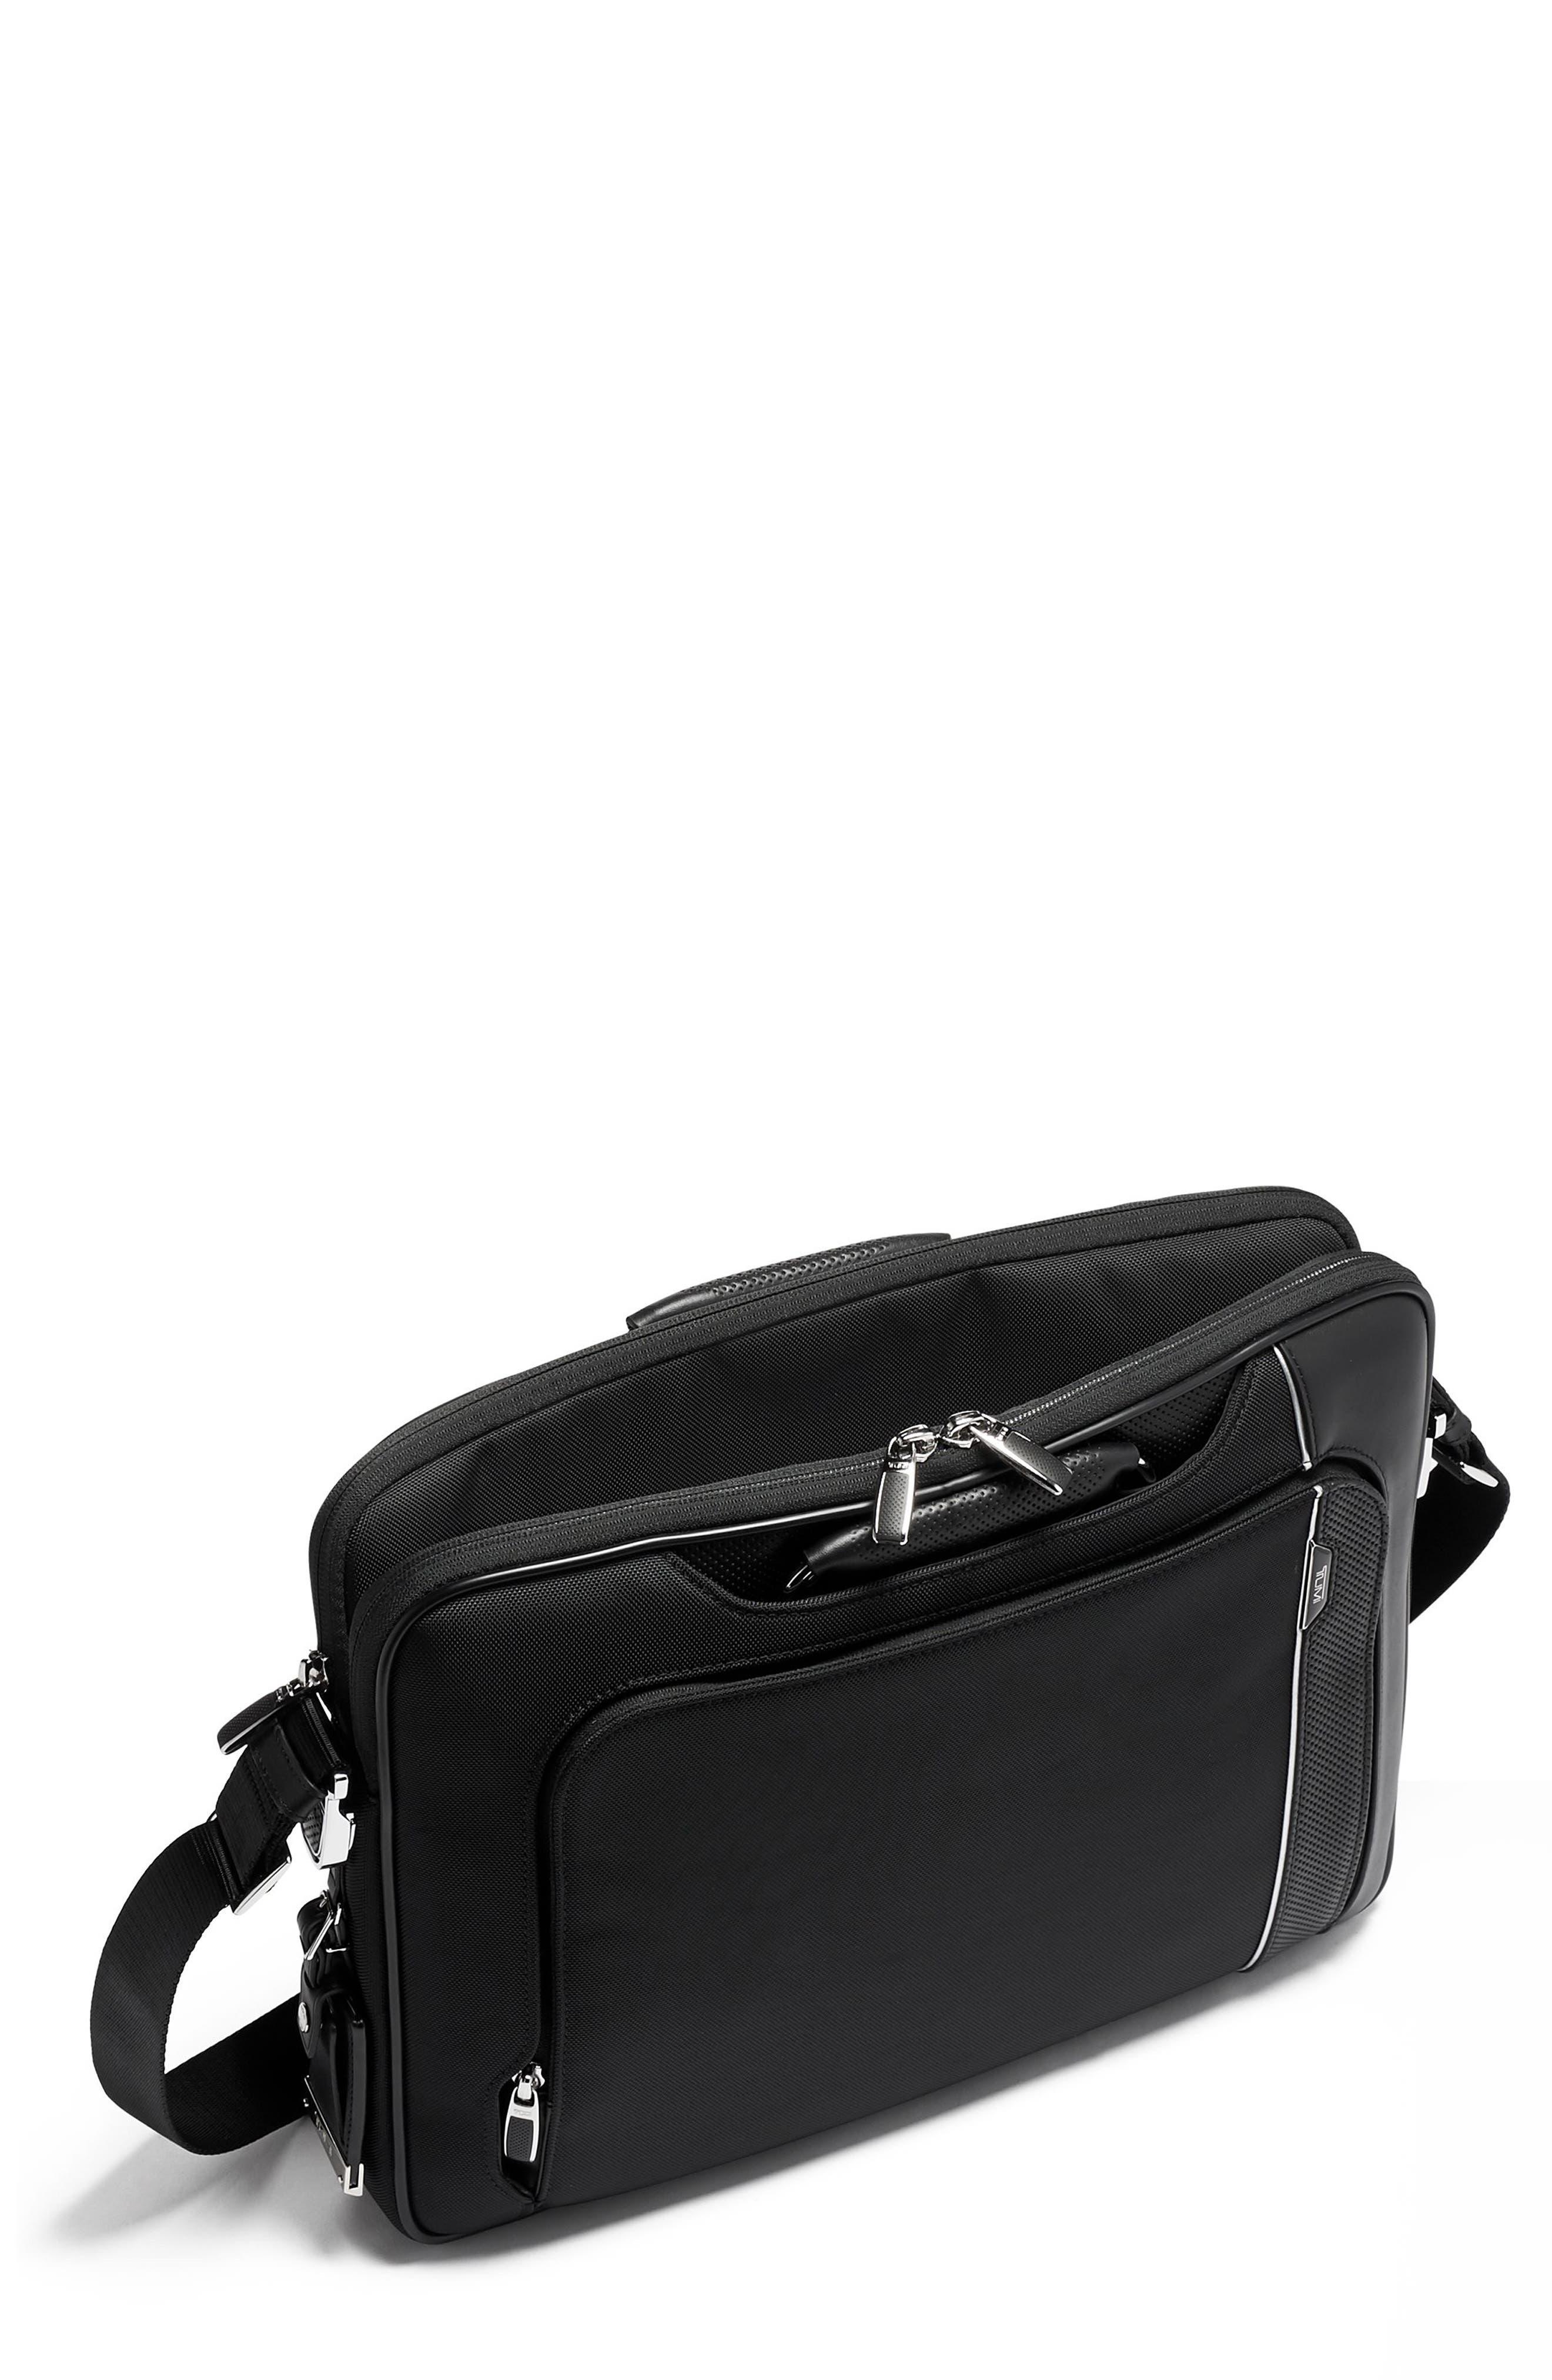 Tumi Arrive Hannover Slim Briefcase - Black